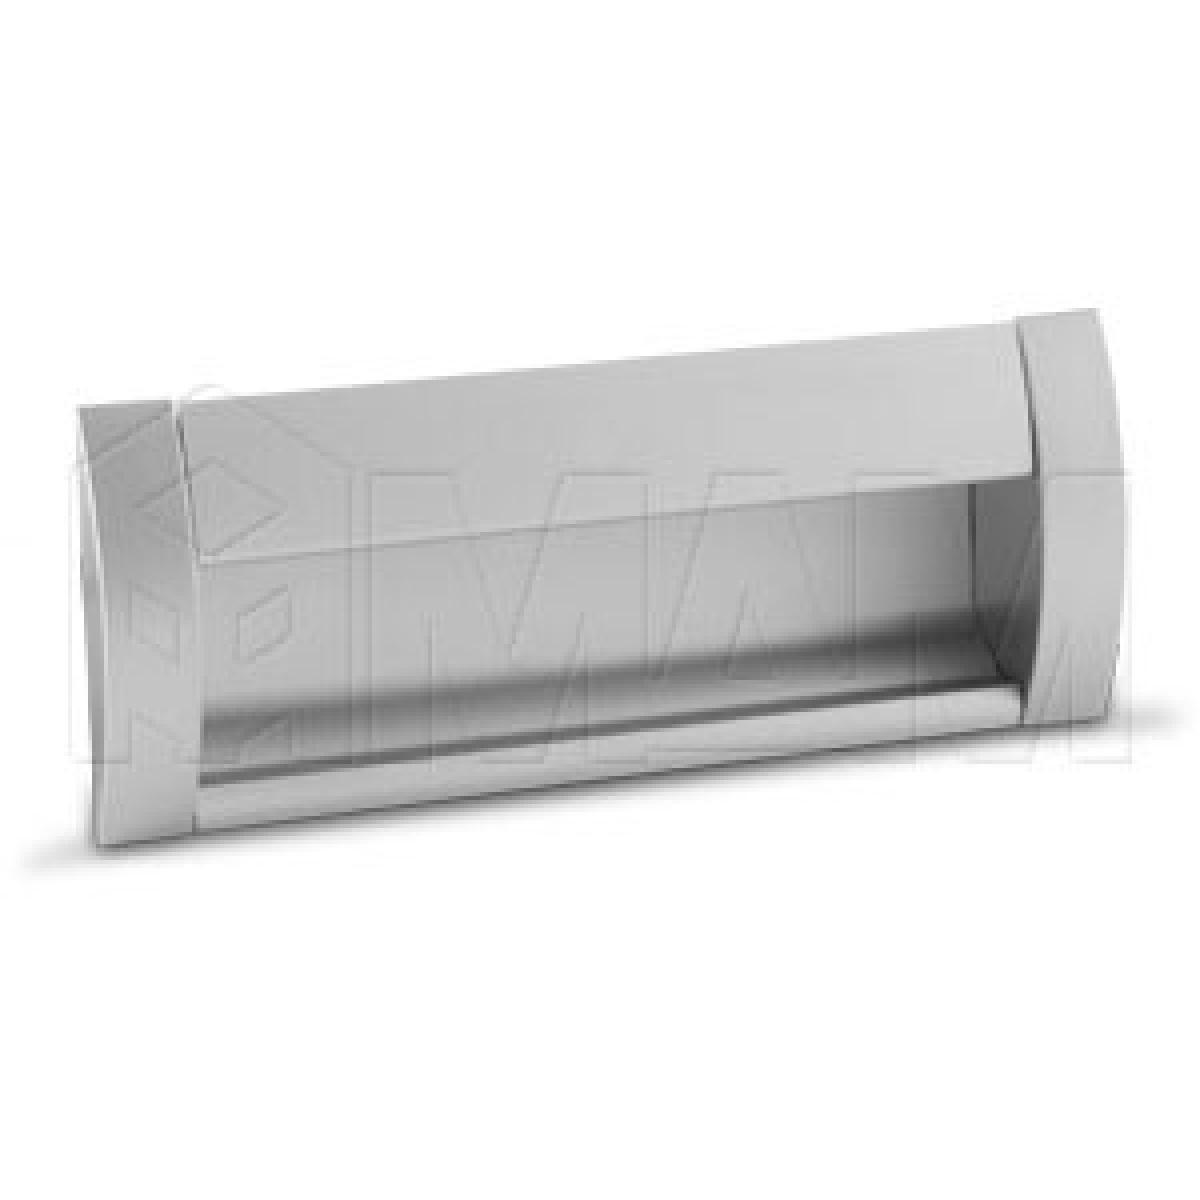 Ручка-раковина 128мм крепление саморезами алюминий